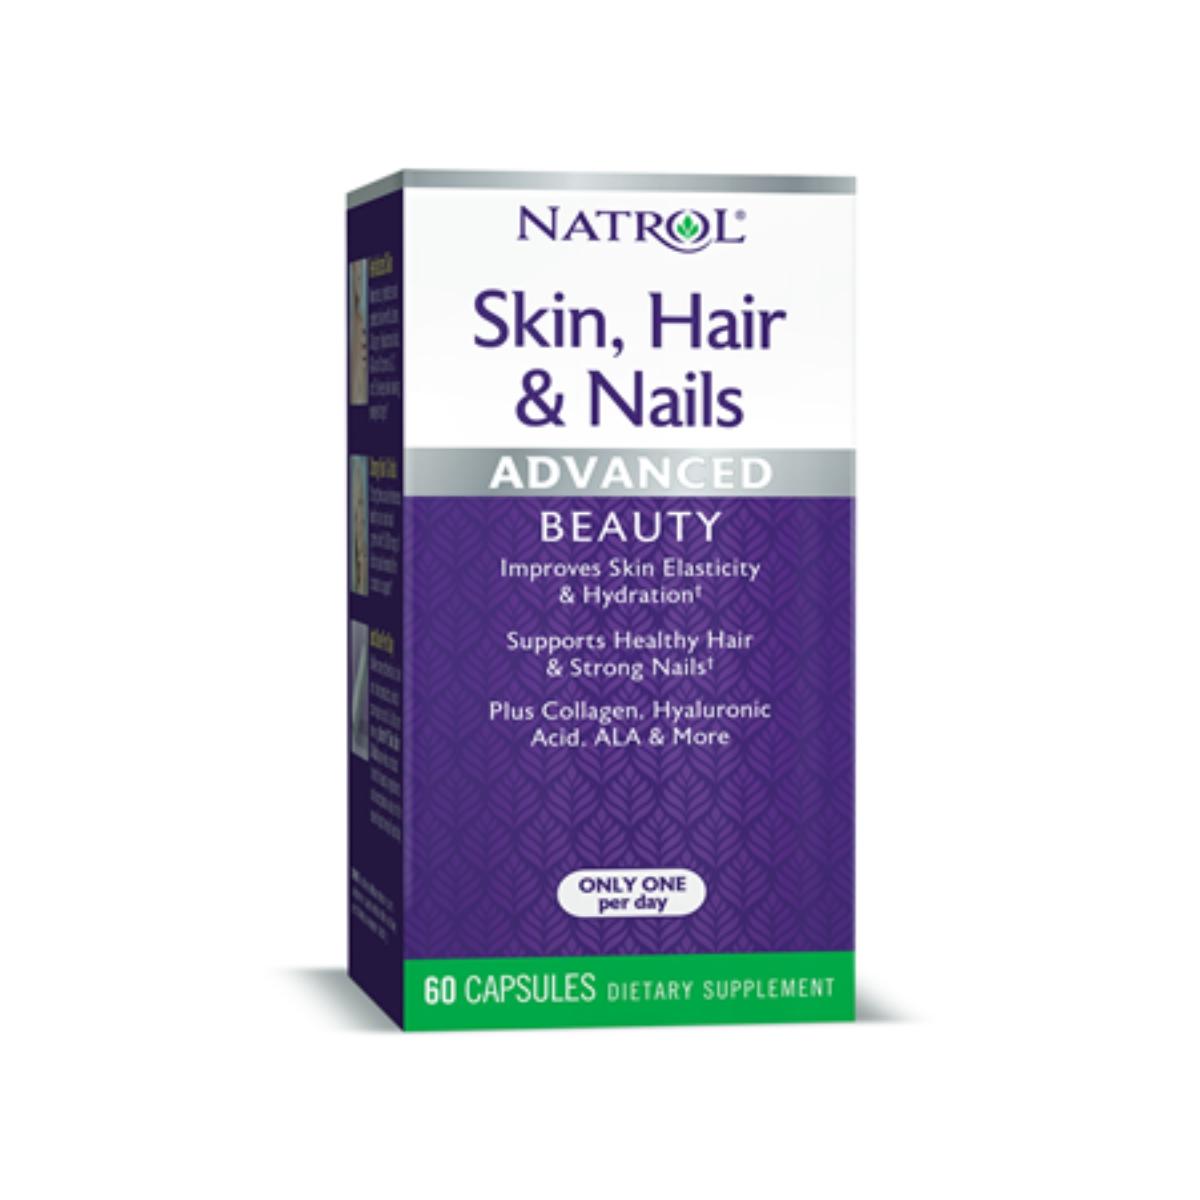 Skin, Hair & Nails Adanced Beauty 60Caps -  Natrol